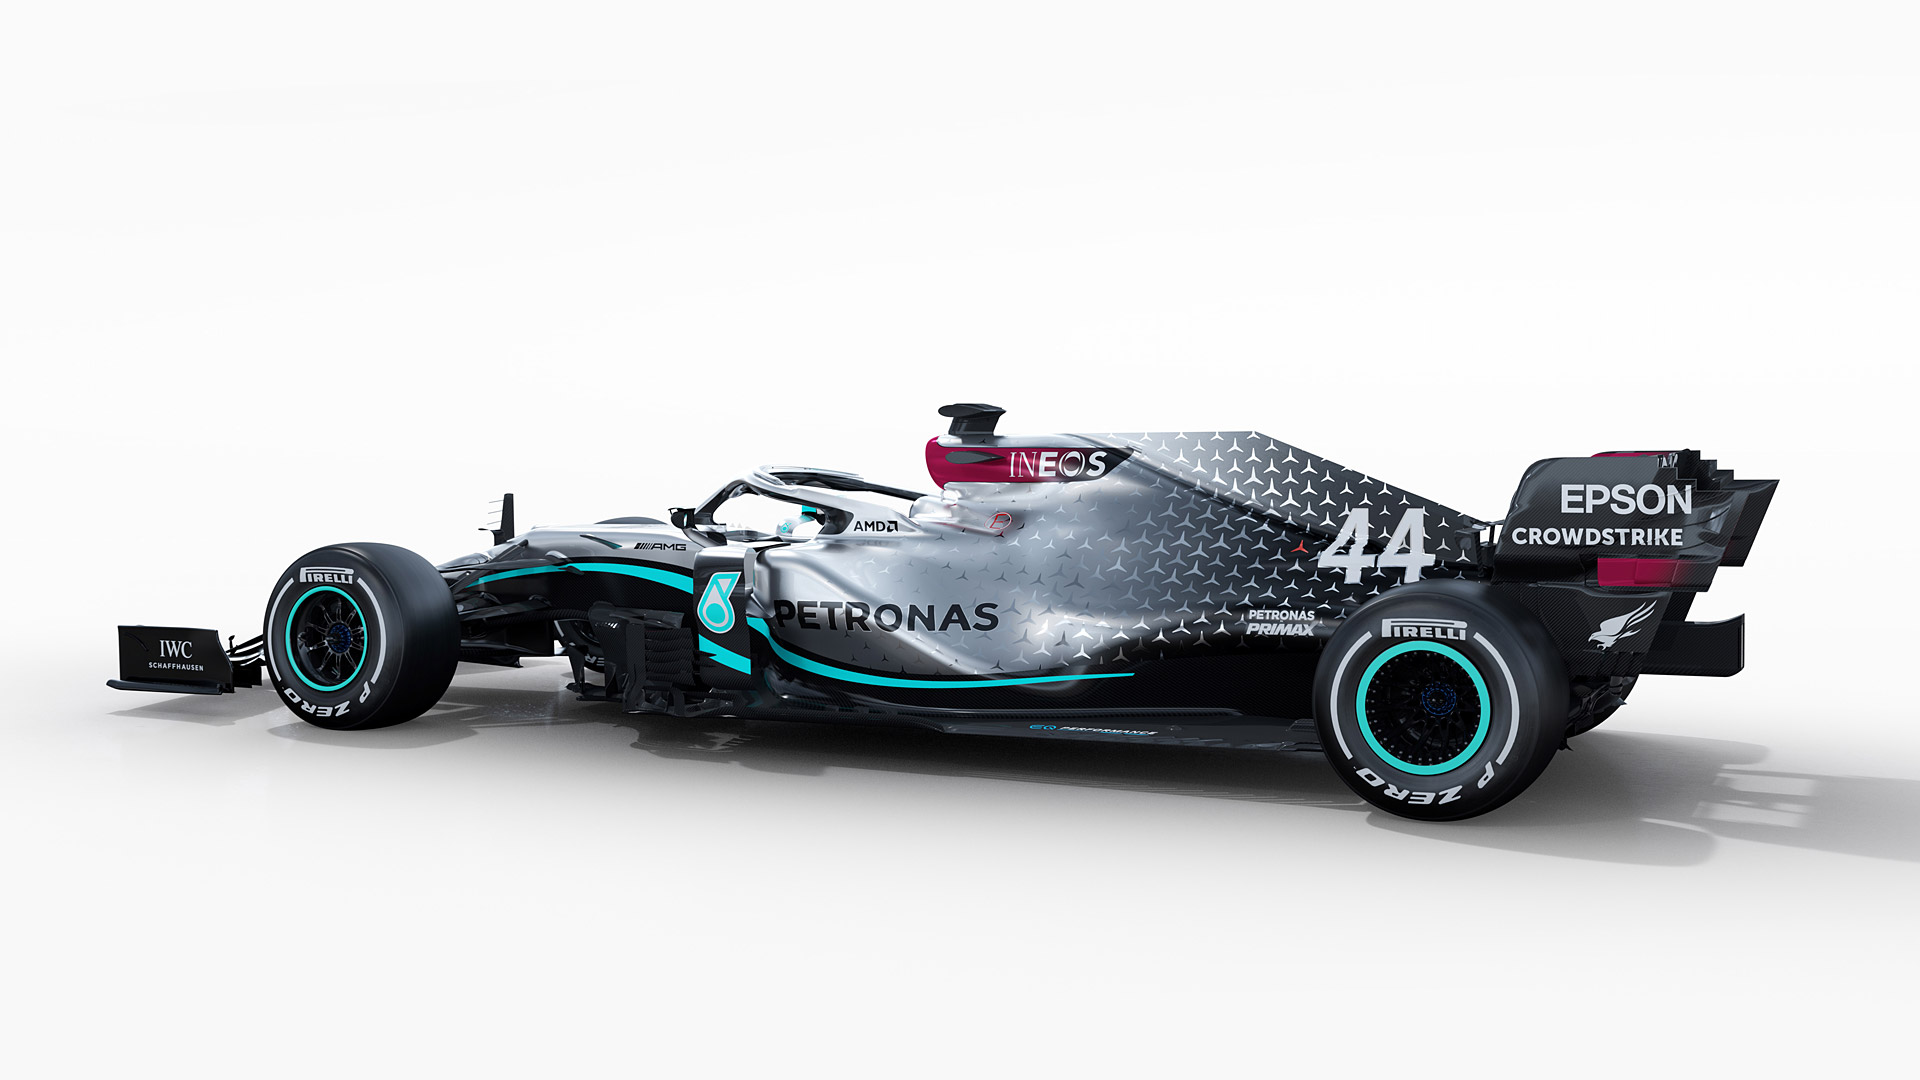 2020 Mercedes AMG W11 EQ Performance Wallpapers Specs Videos 1920x1080